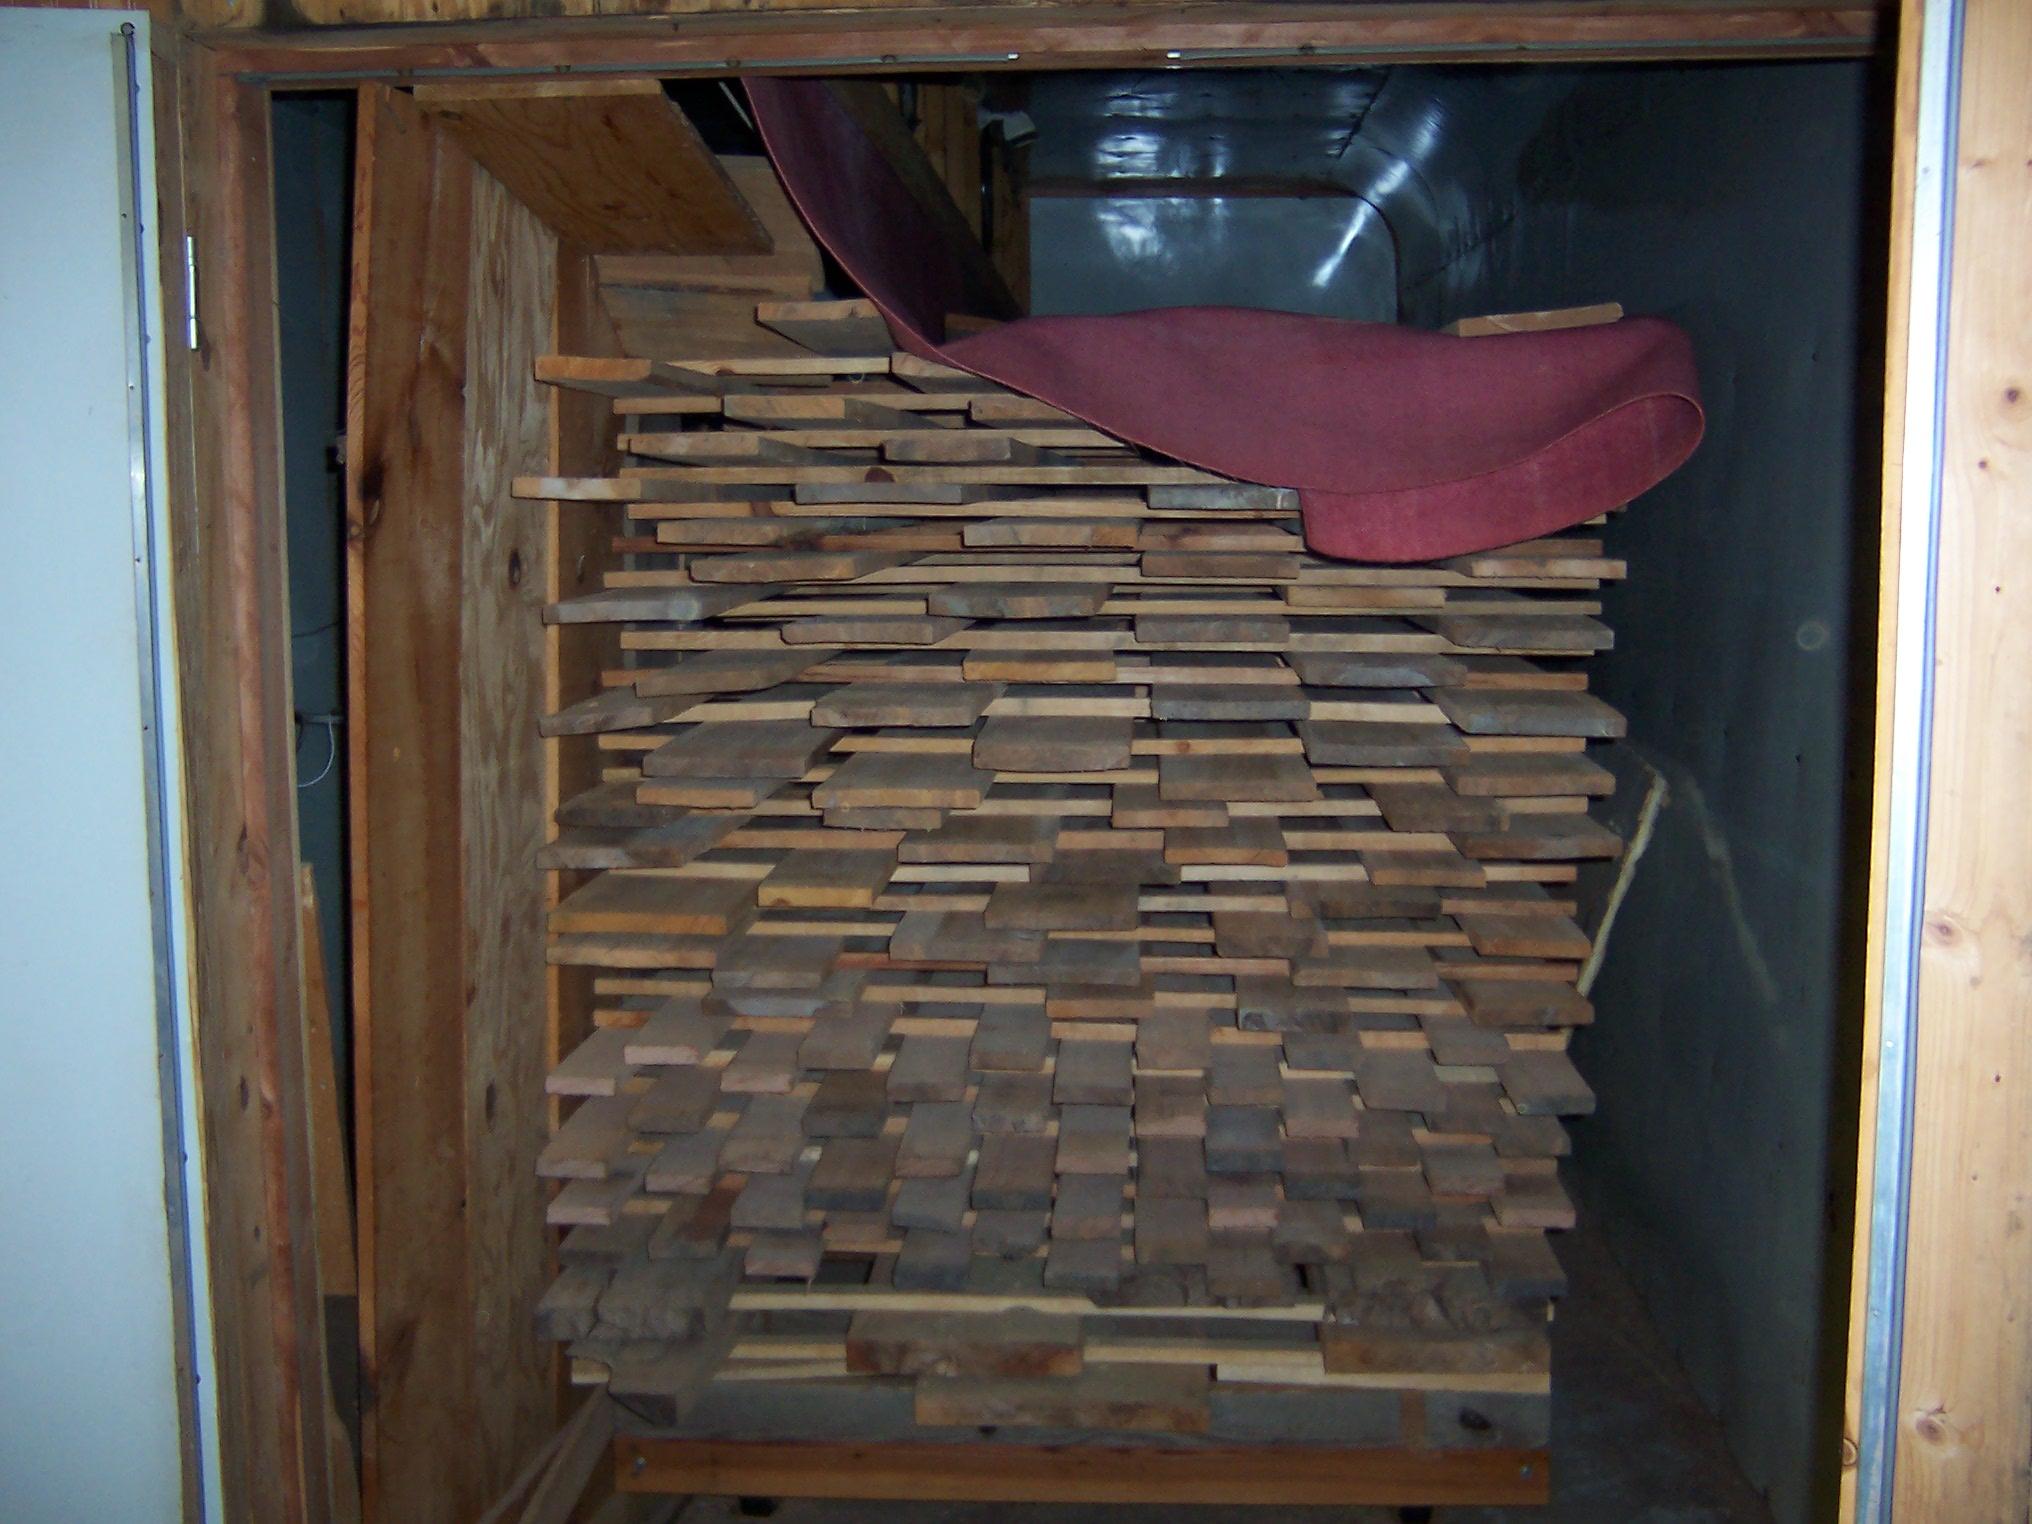 Hardwood lumber hardwood lumber everett for Hardwood floors everett wa